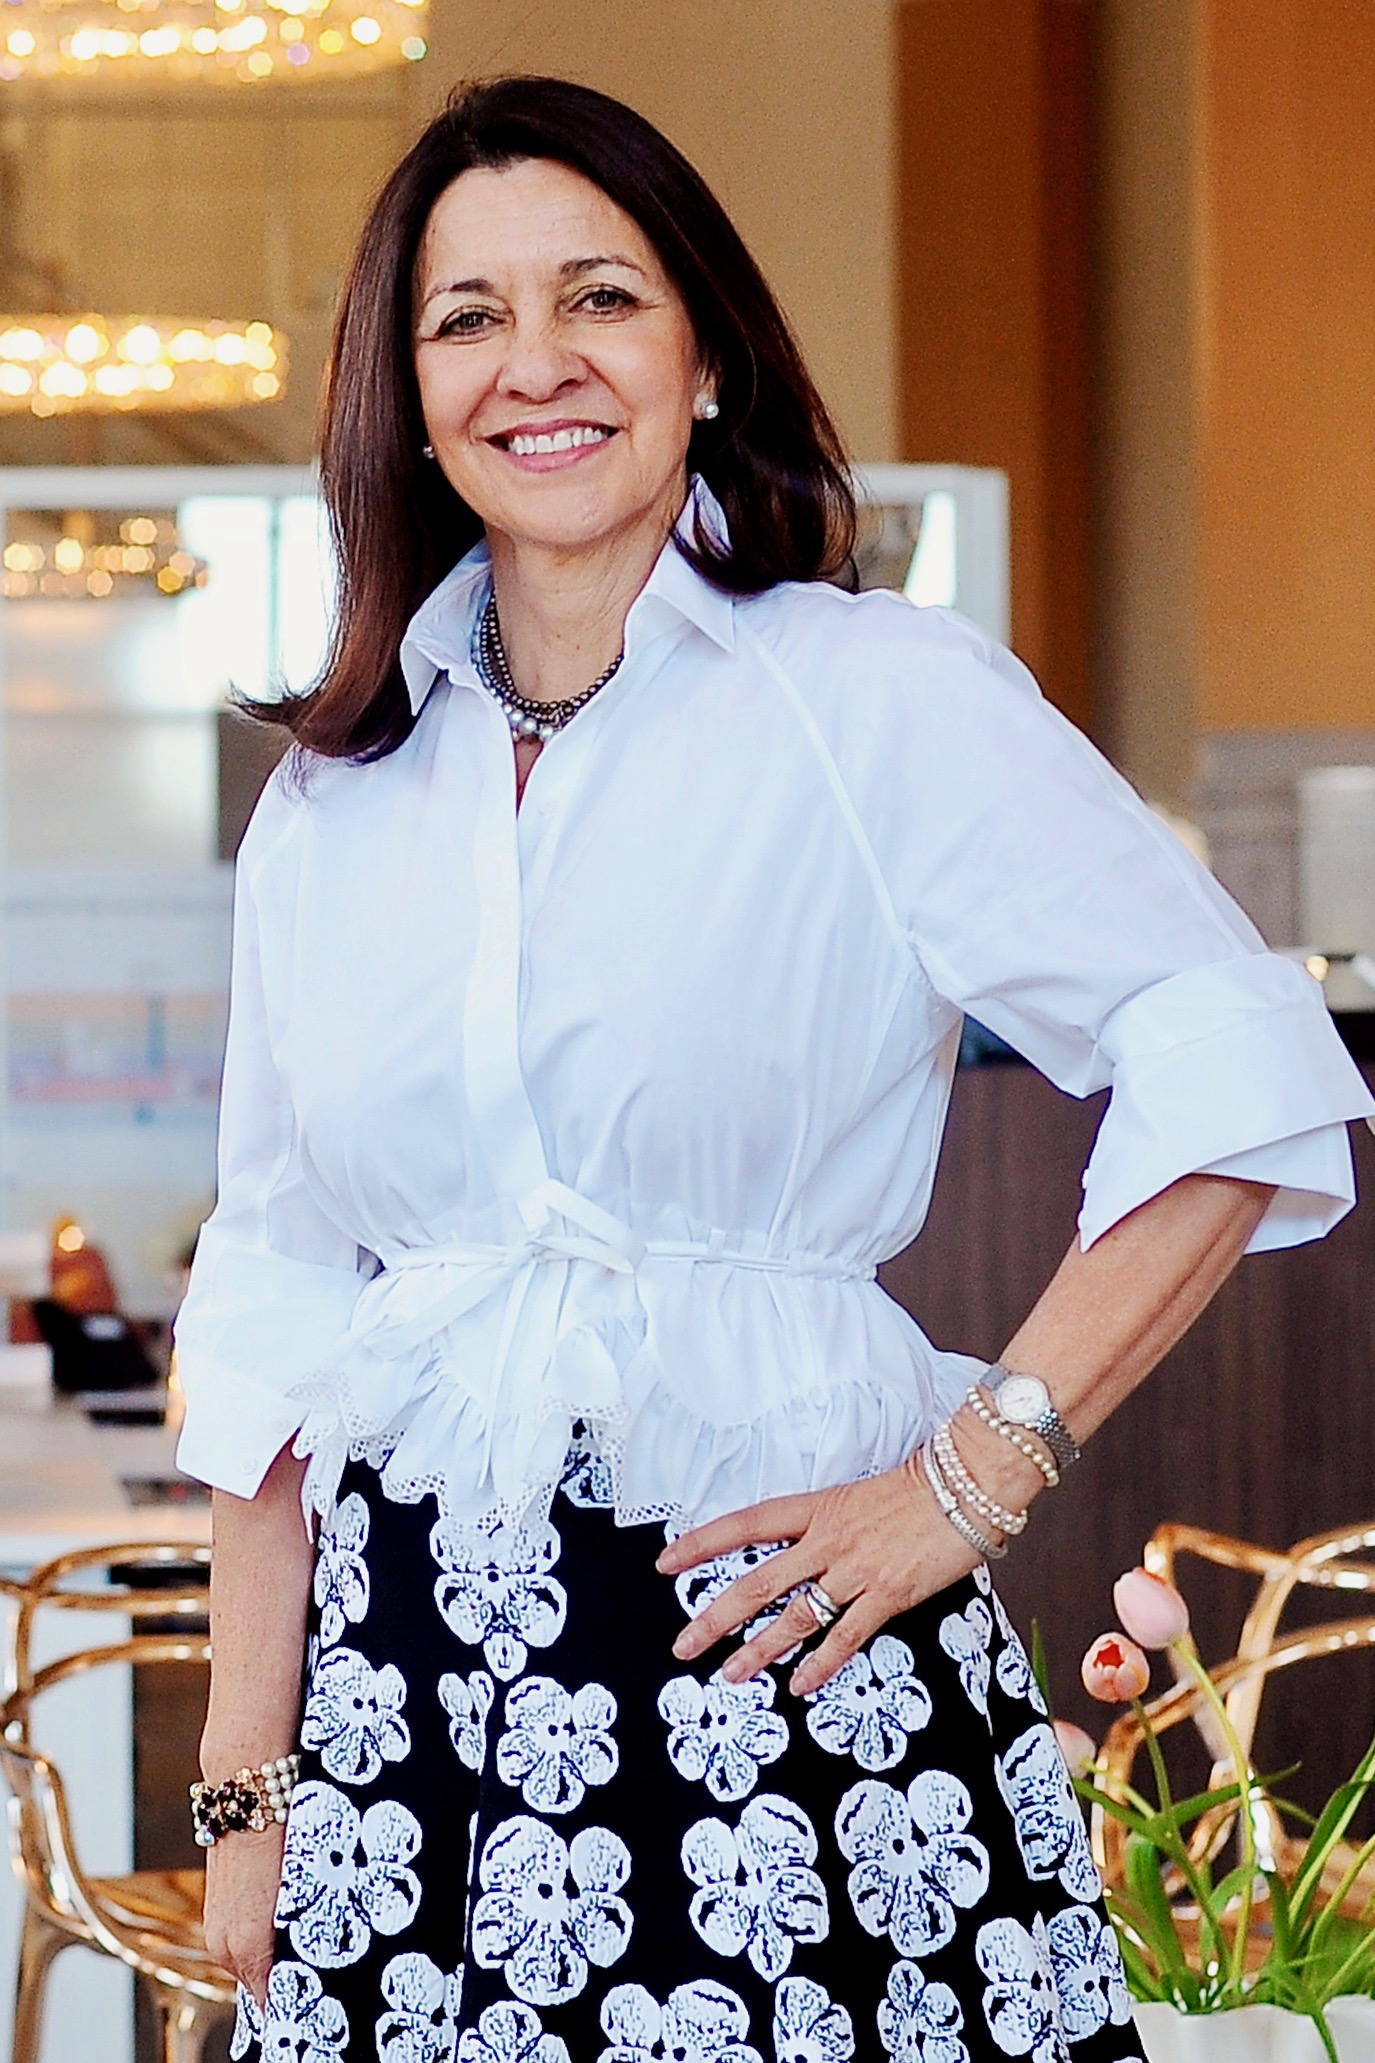 Maria Griego-Raby, President & Principal